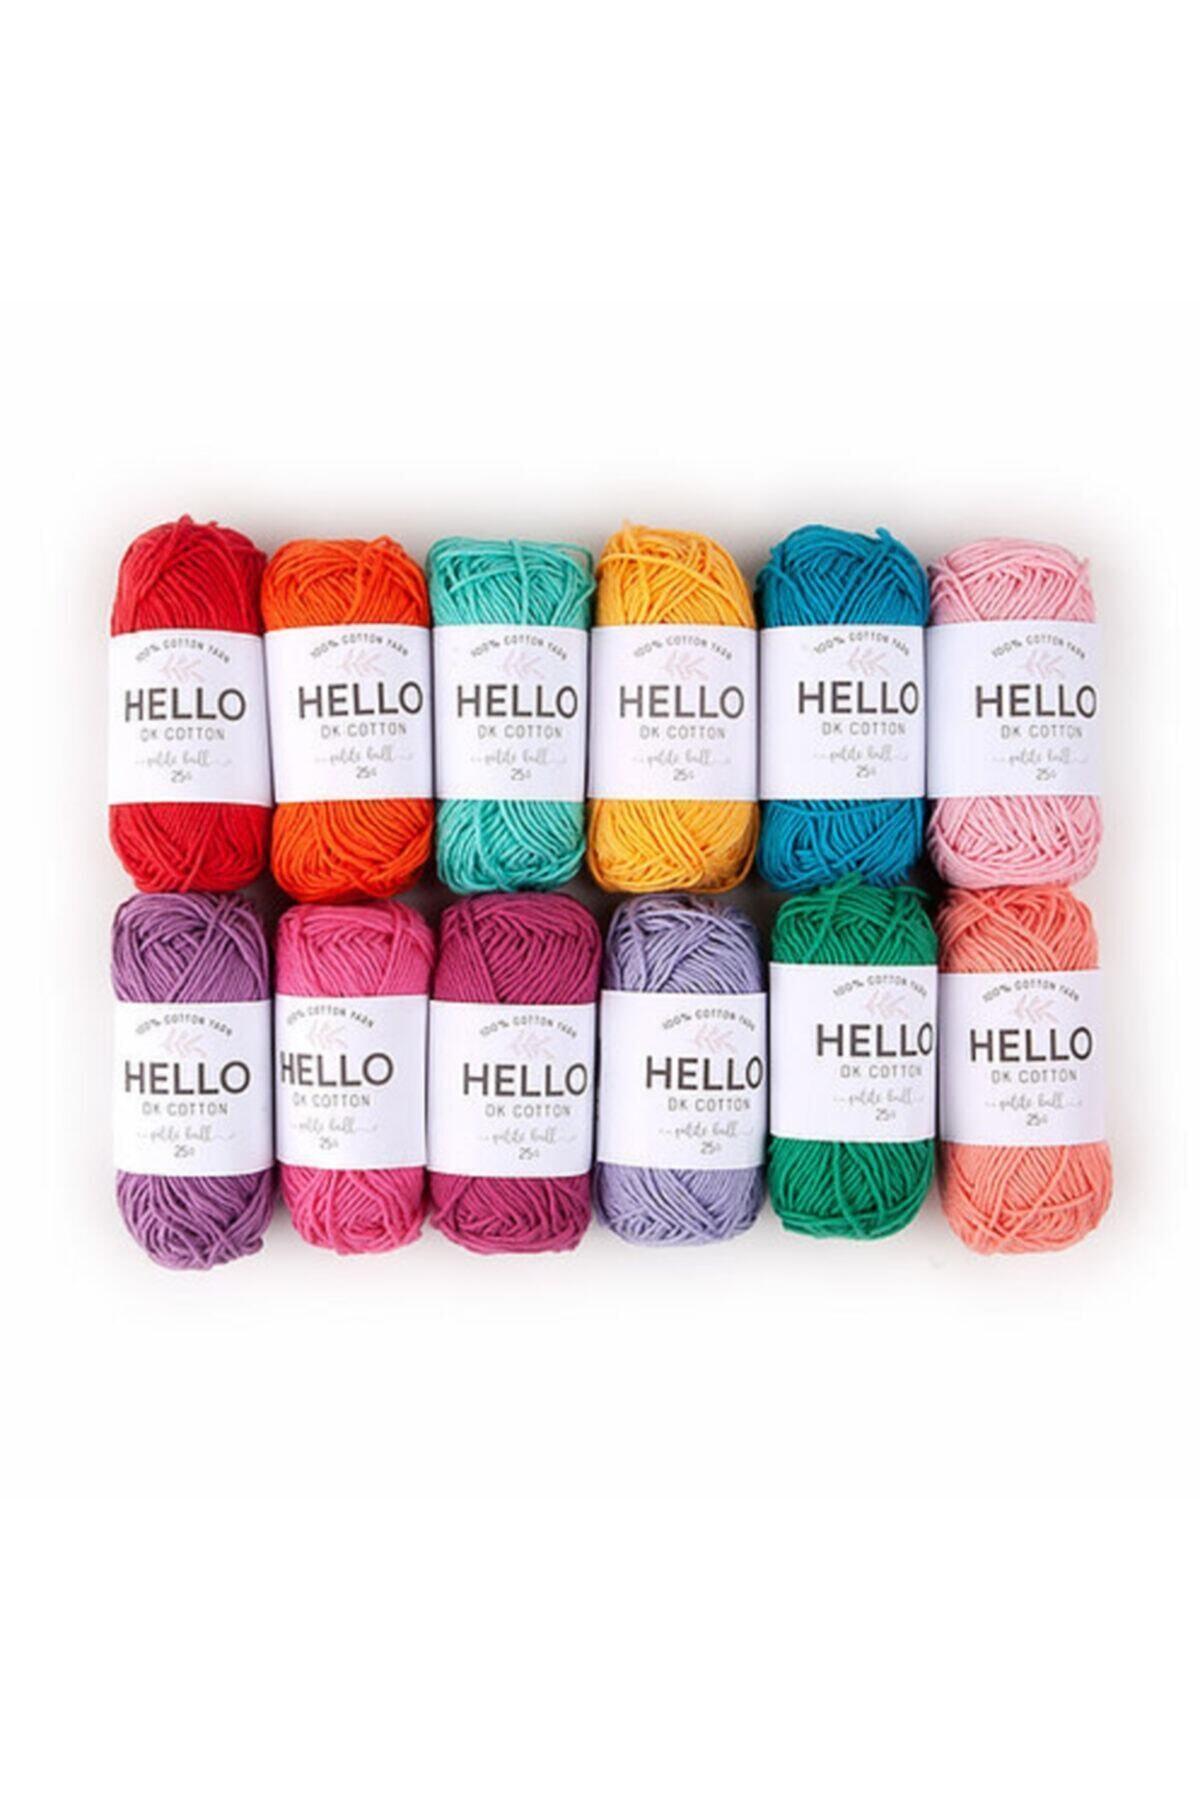 HELLO Punch Ve Amigurumi Iplik Seti Minik Yumaklar 25g X 12 Adet Canlı Renkler 1